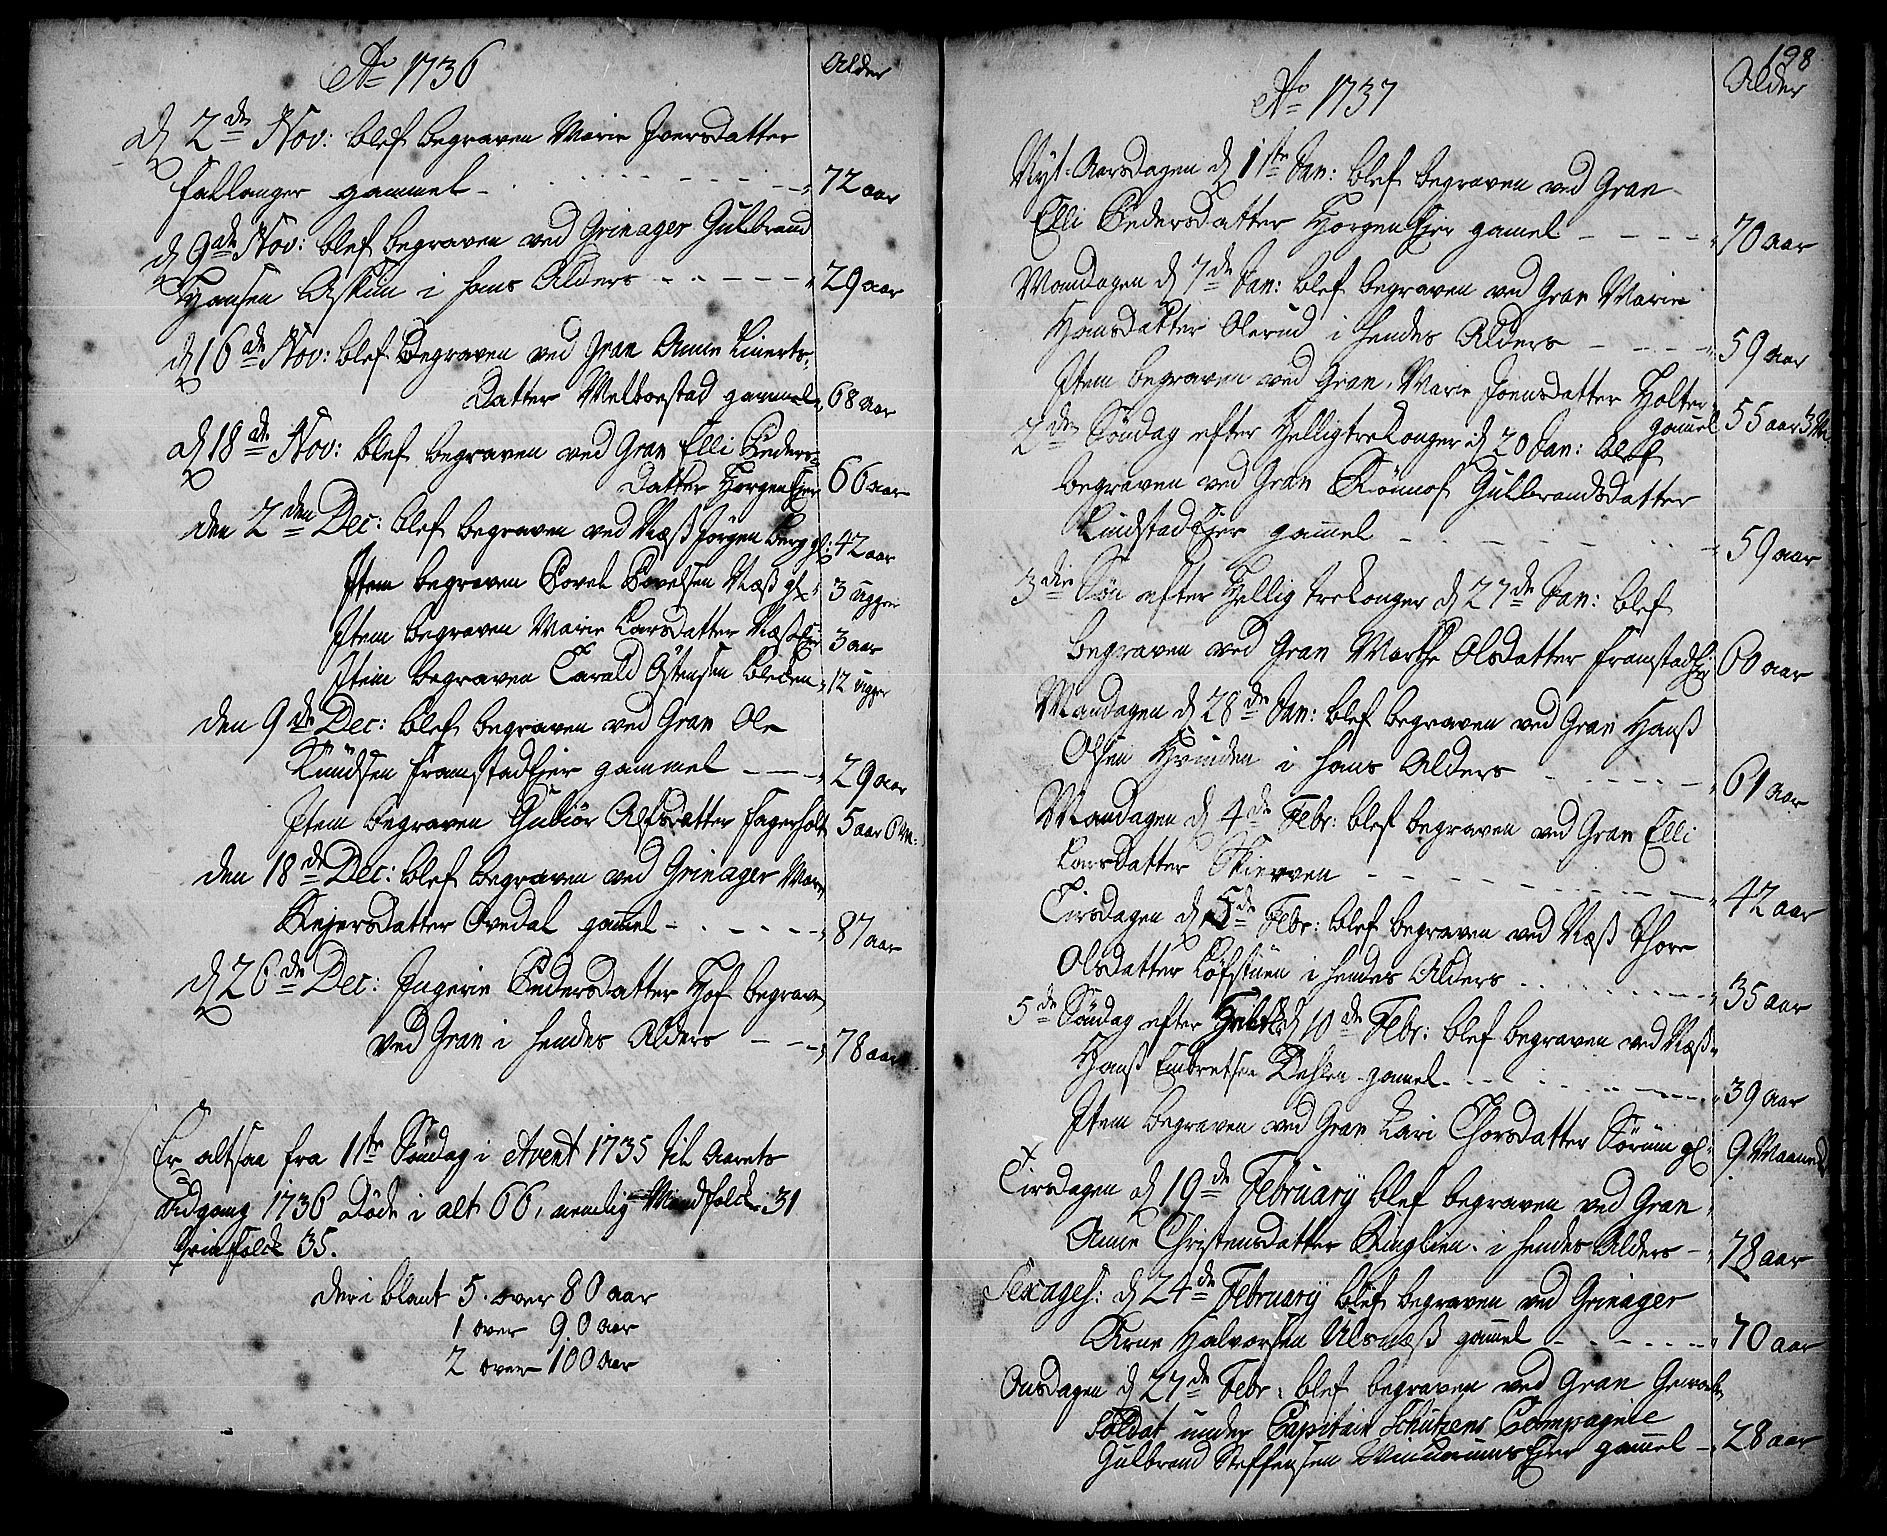 SAH, Gran prestekontor, Ministerialbok nr. 2, 1732-1744, s. 198